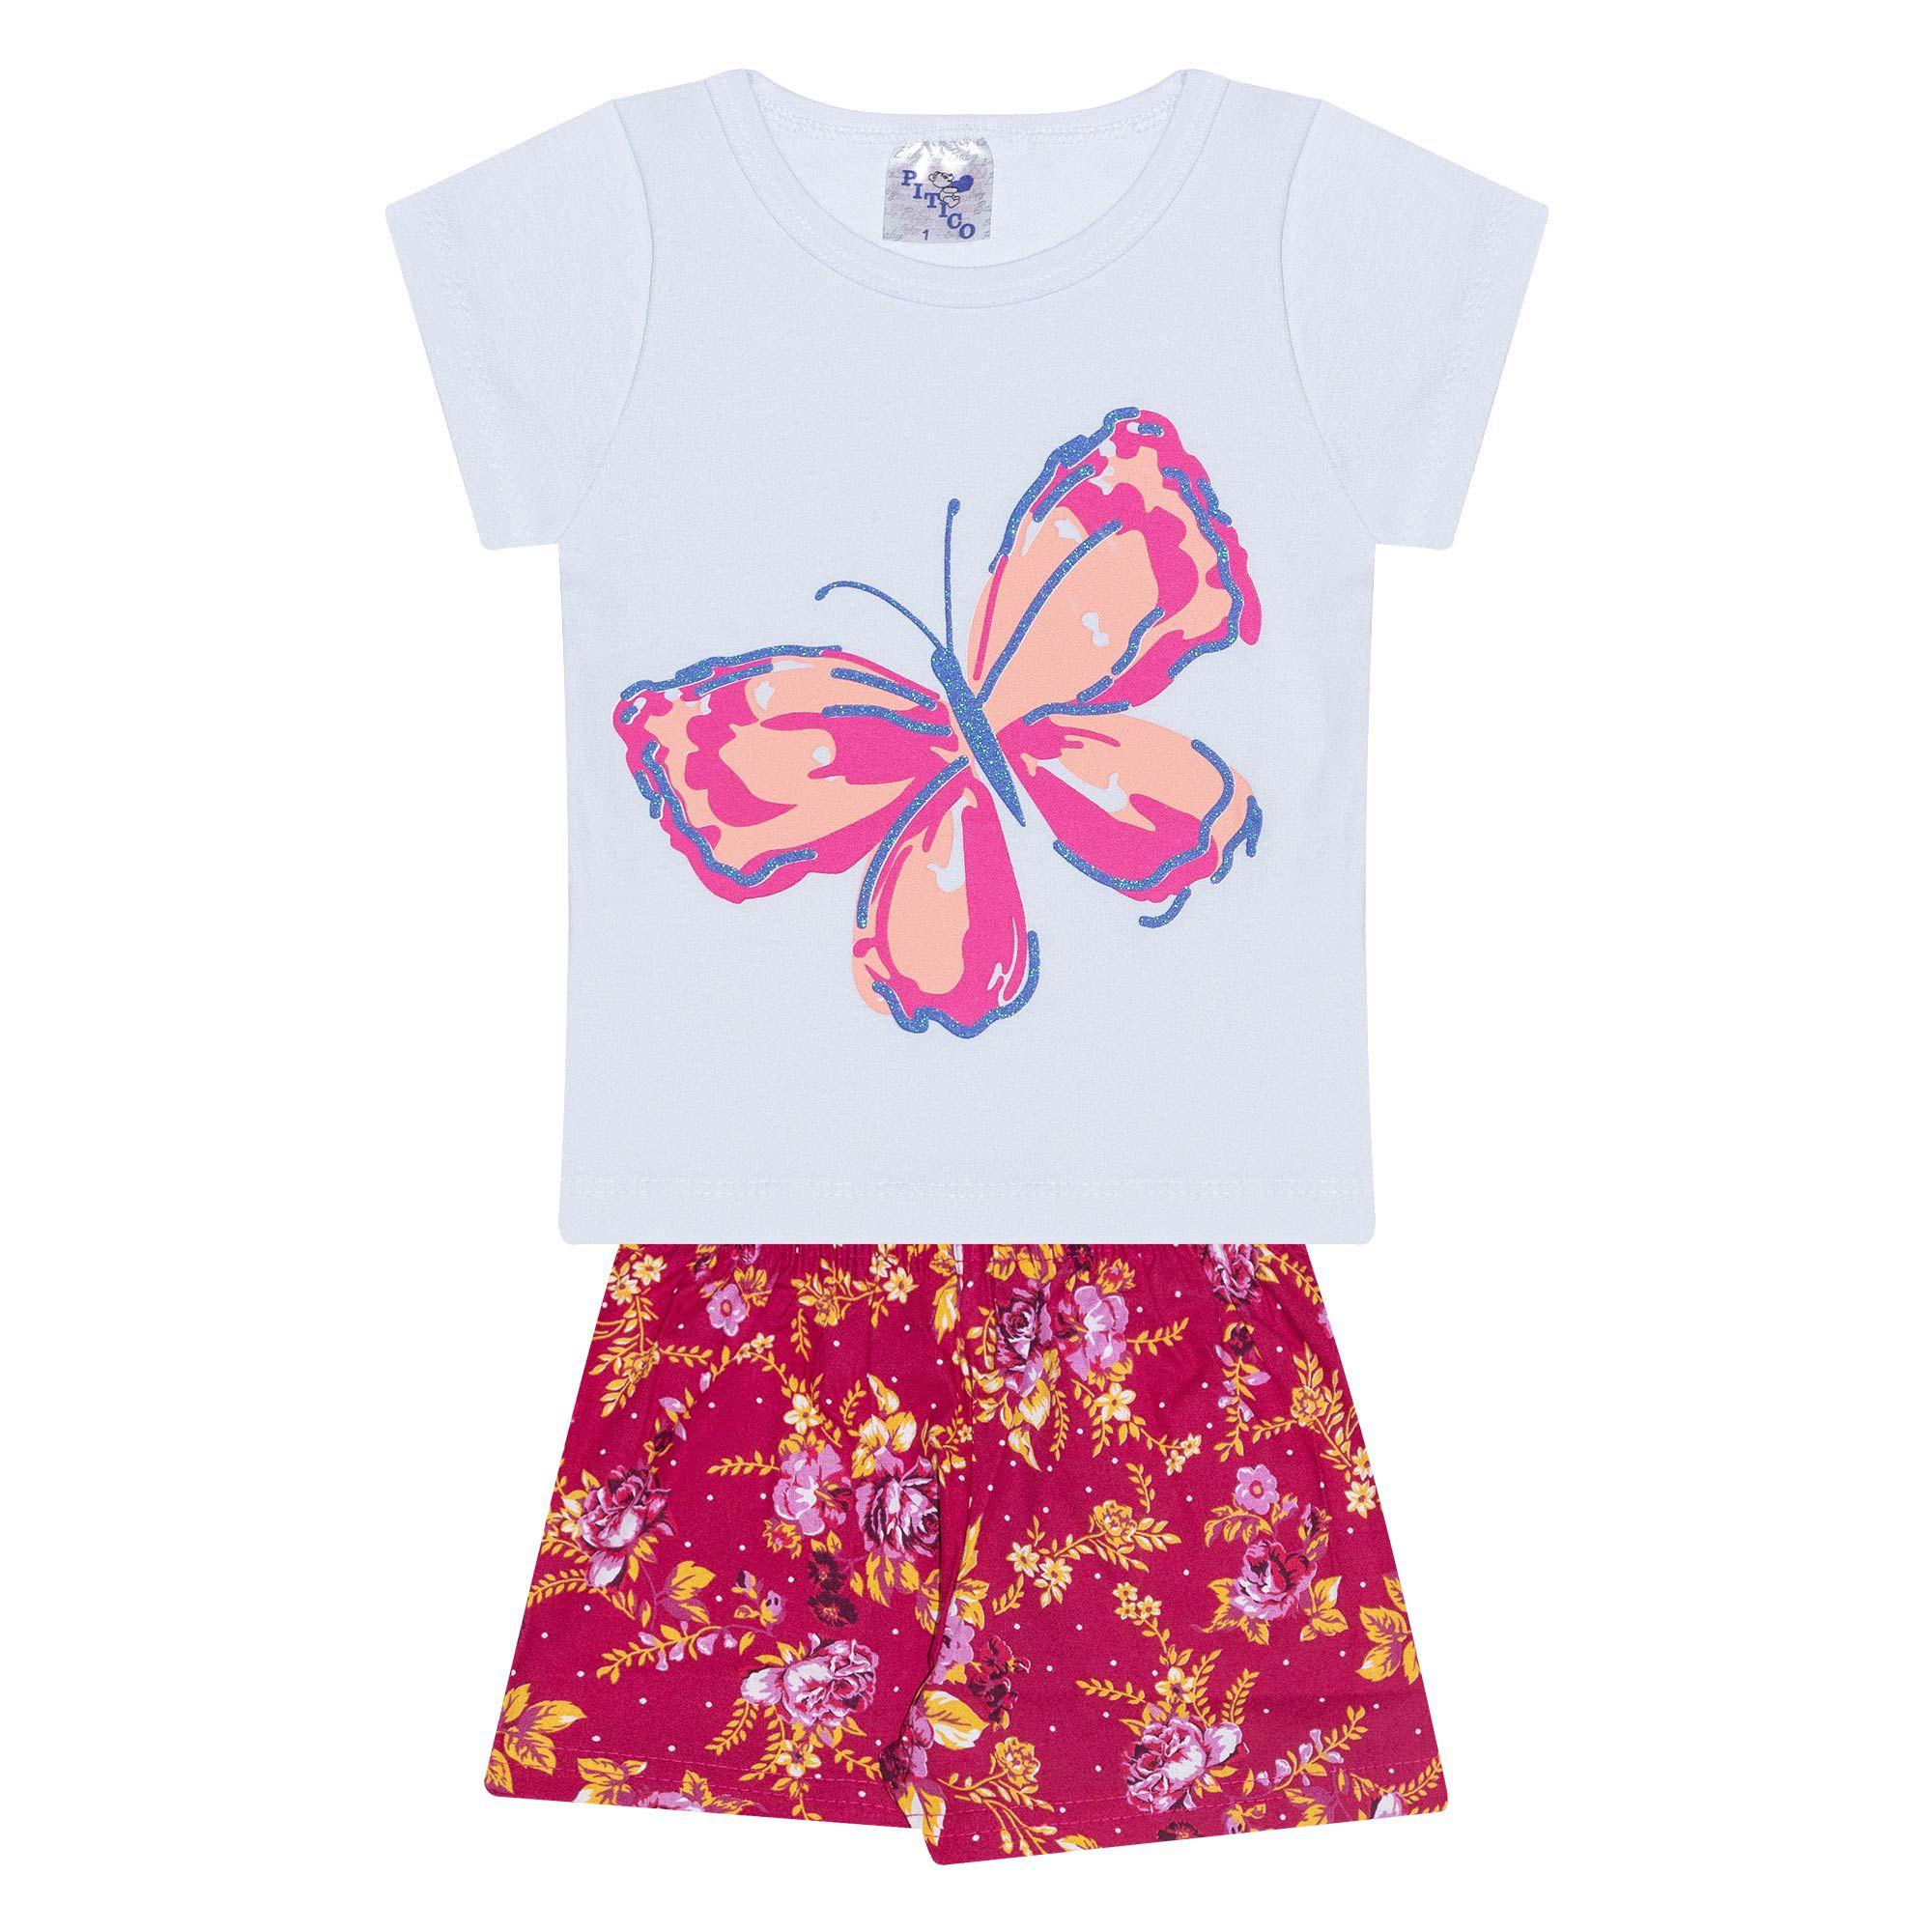 Conjunto Infantil Feminino - Ref 1018 - Branco/Pink - Pitico